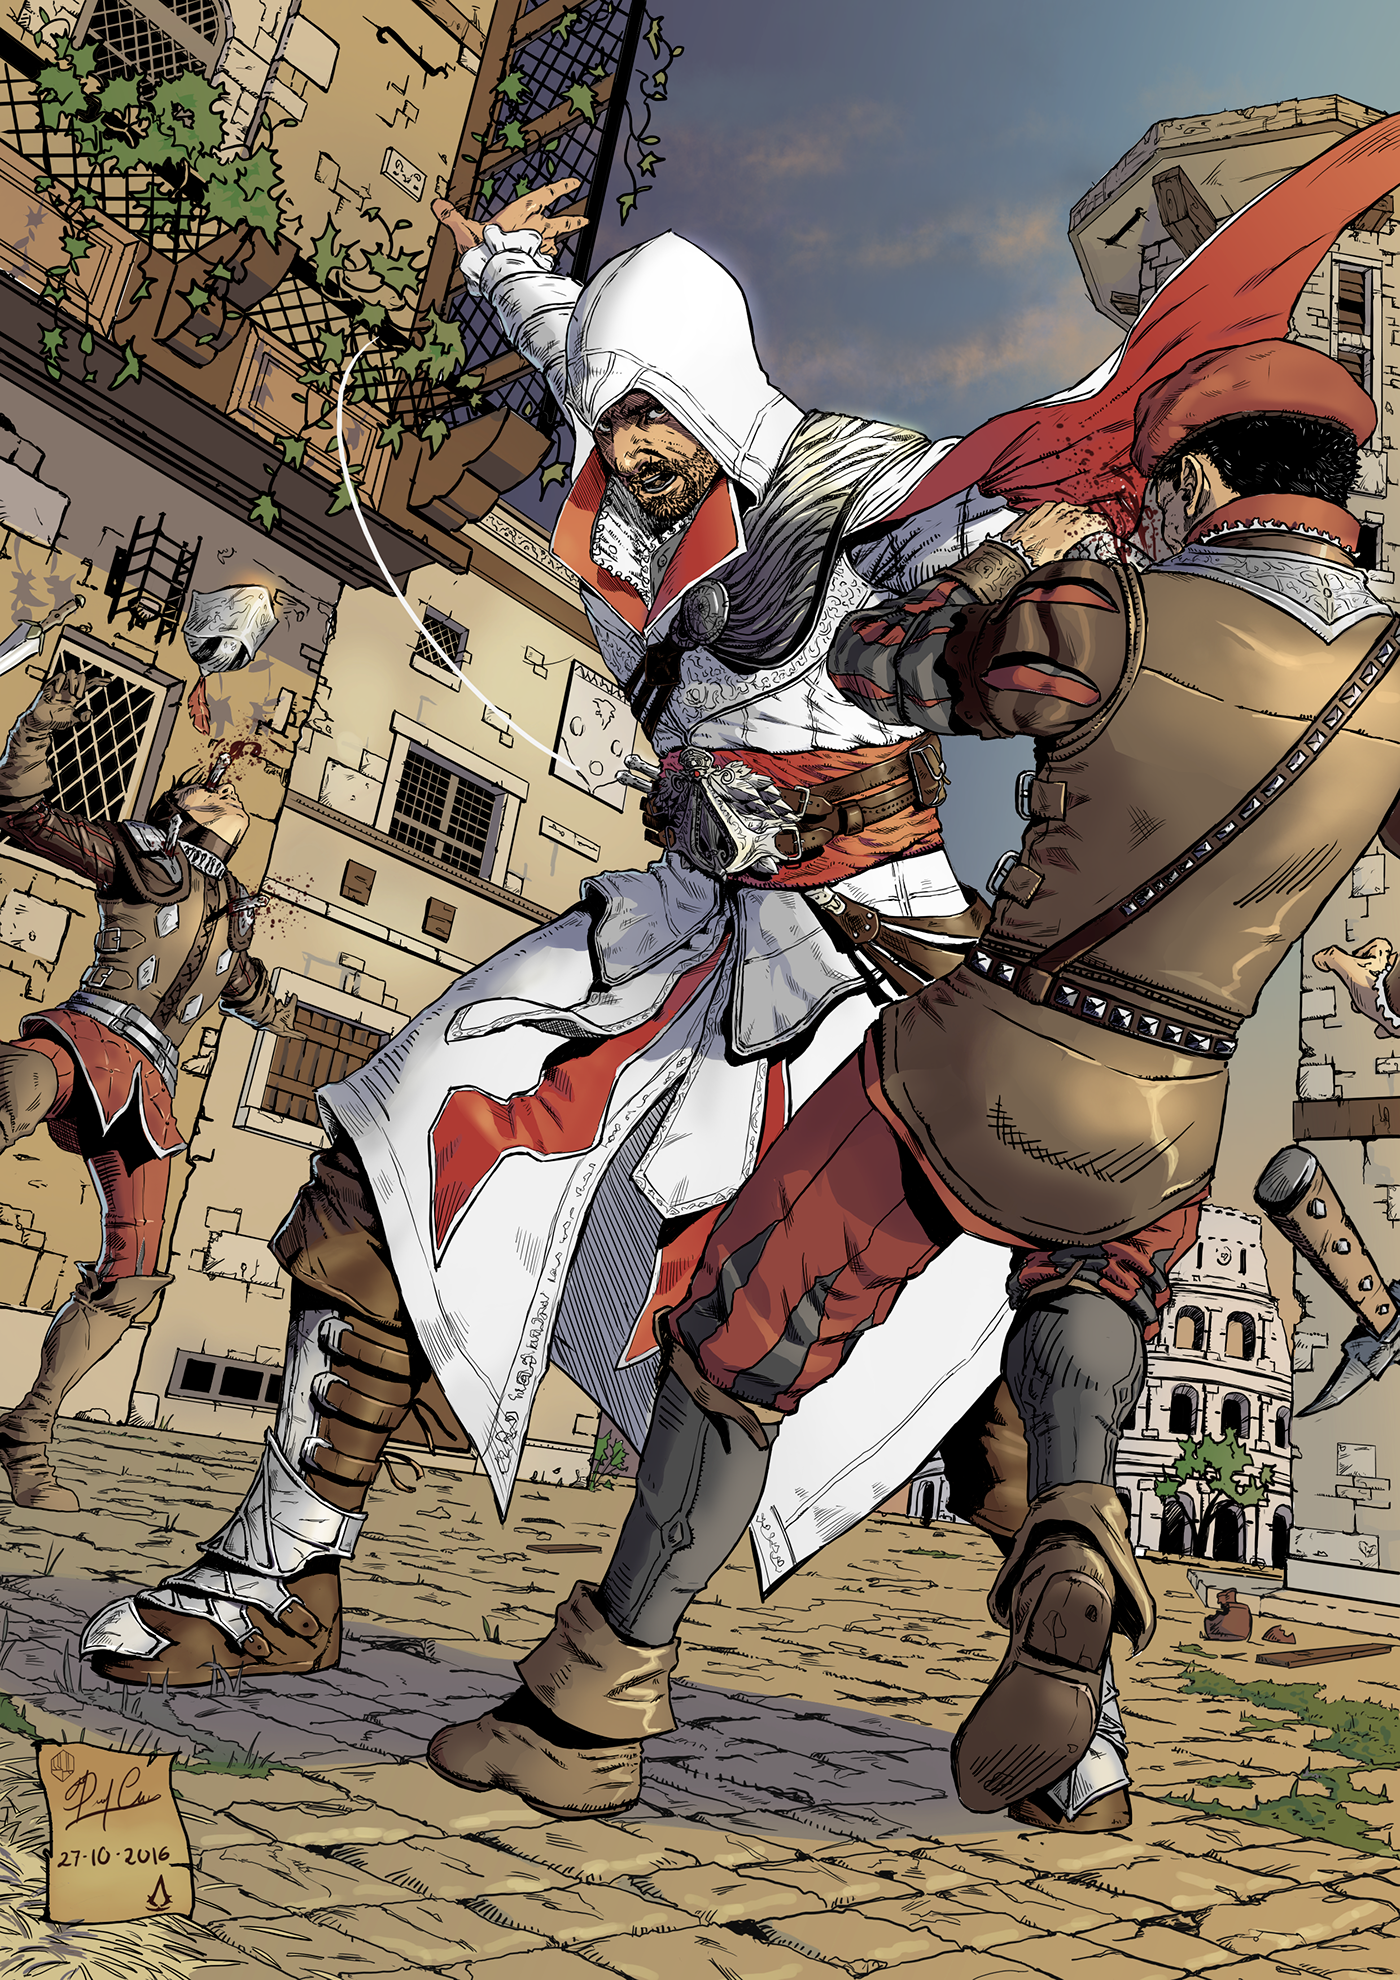 Ezio Auditore Fanart On Behance